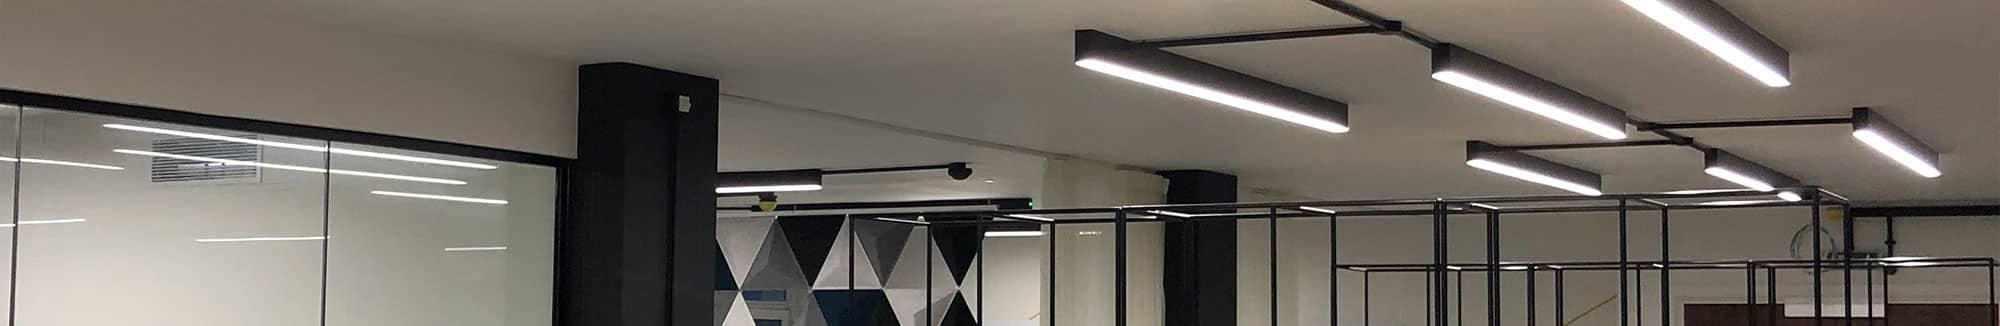 surface lighting mount lighting